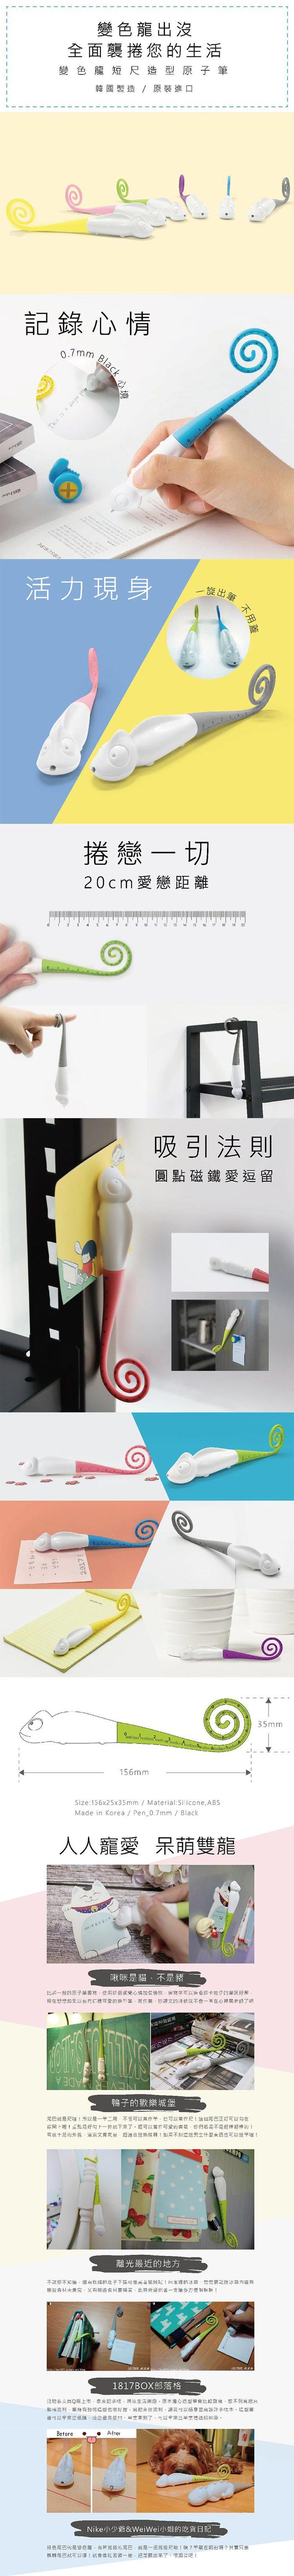 TOYOYO|變色龍短尺造型原子筆 - 粉紅